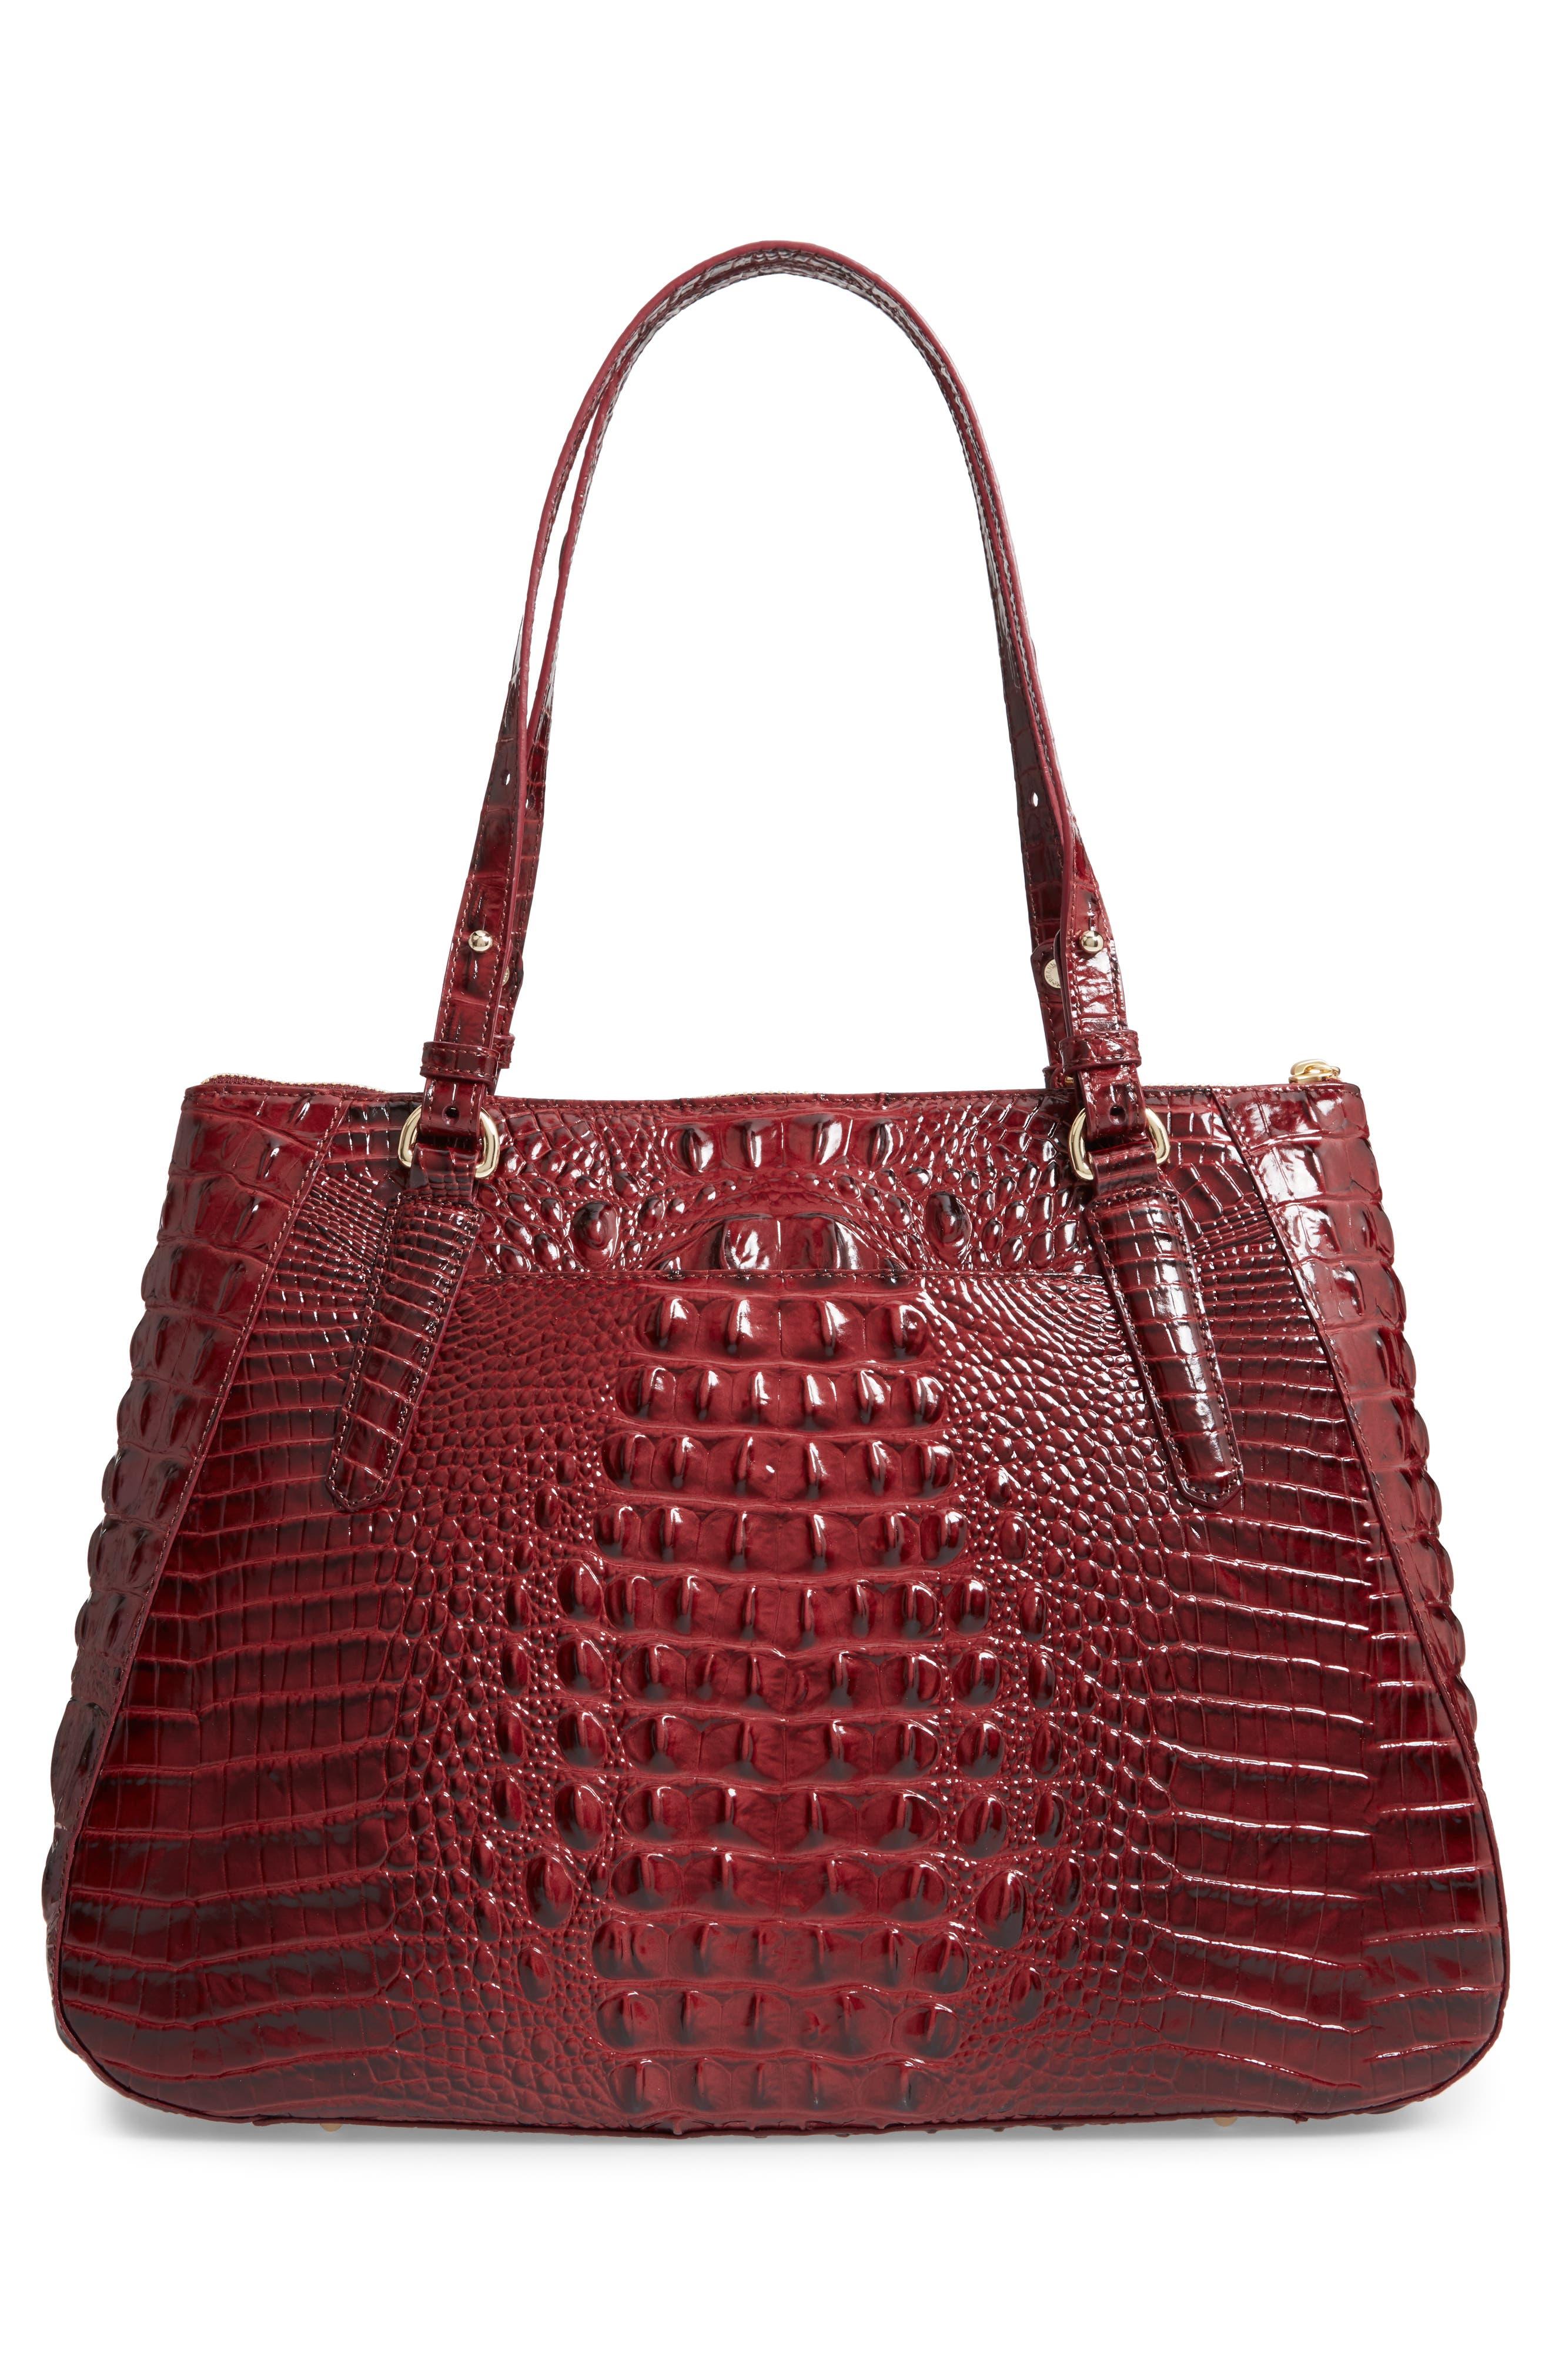 Melbourne - Adina Croc Embossed Leather Satchel,                             Alternate thumbnail 5, color,                             Tart